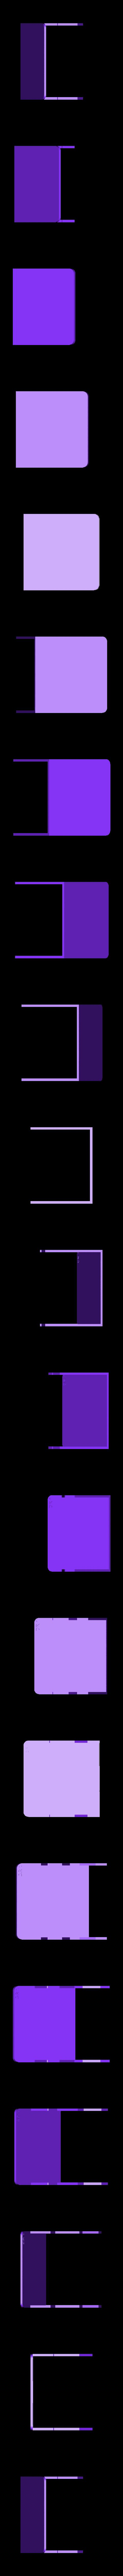 M4 P1.stl Download STL file Brush module c is accessory N ° 1 • Template to 3D print, prusai33